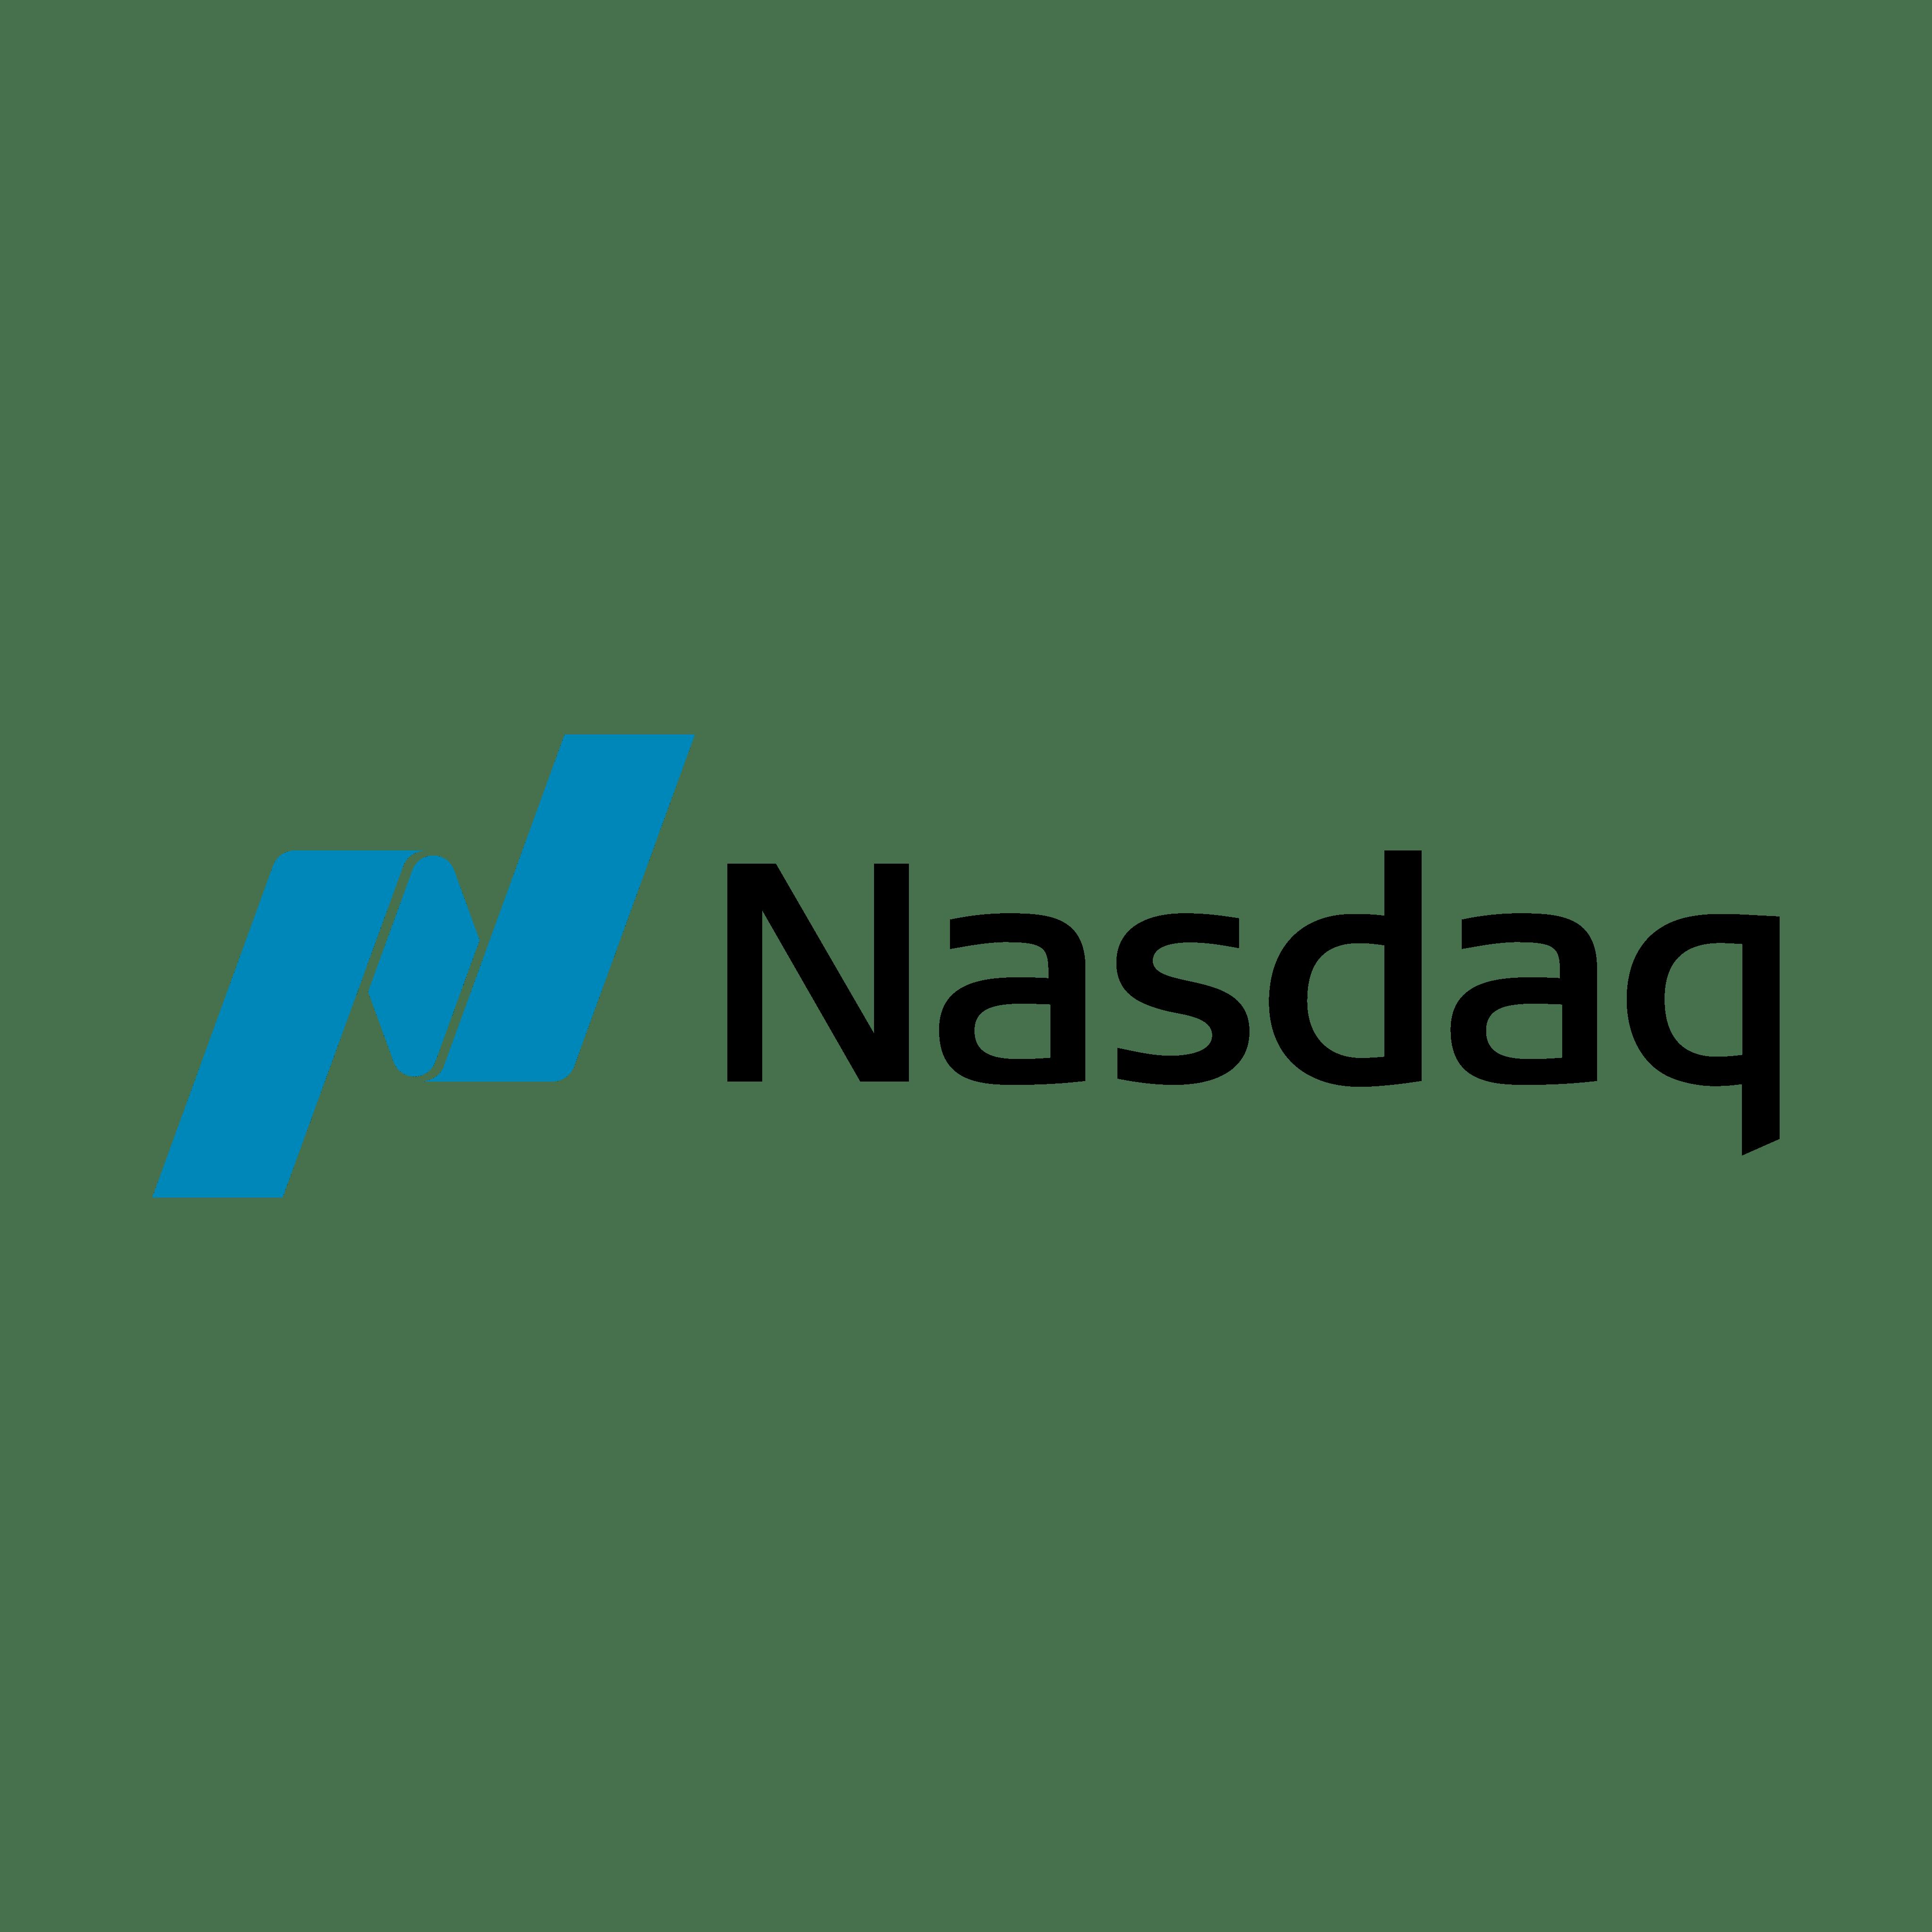 nasdaq-logo-0